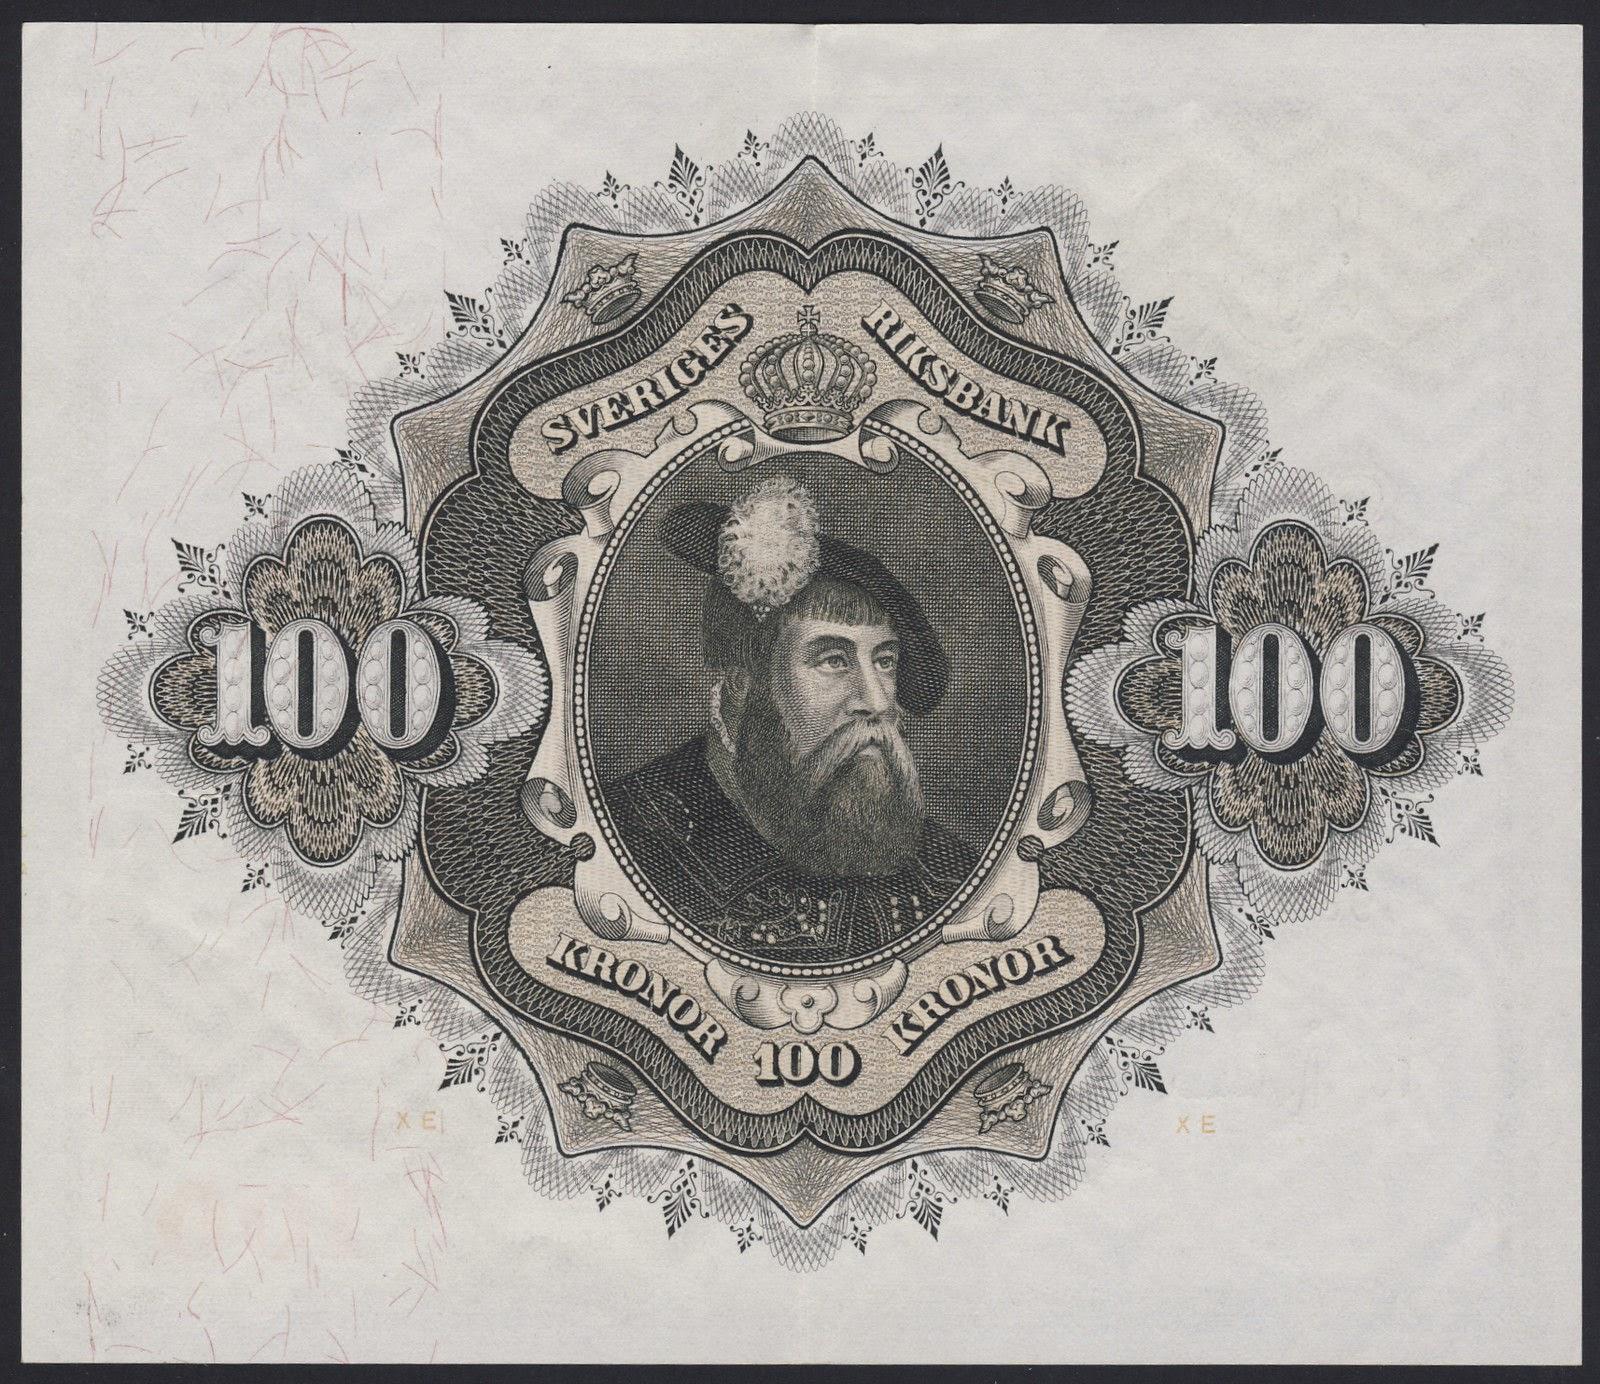 Sweden Banknotes 50 Kronor banknote 1950 King Gustav Vasa